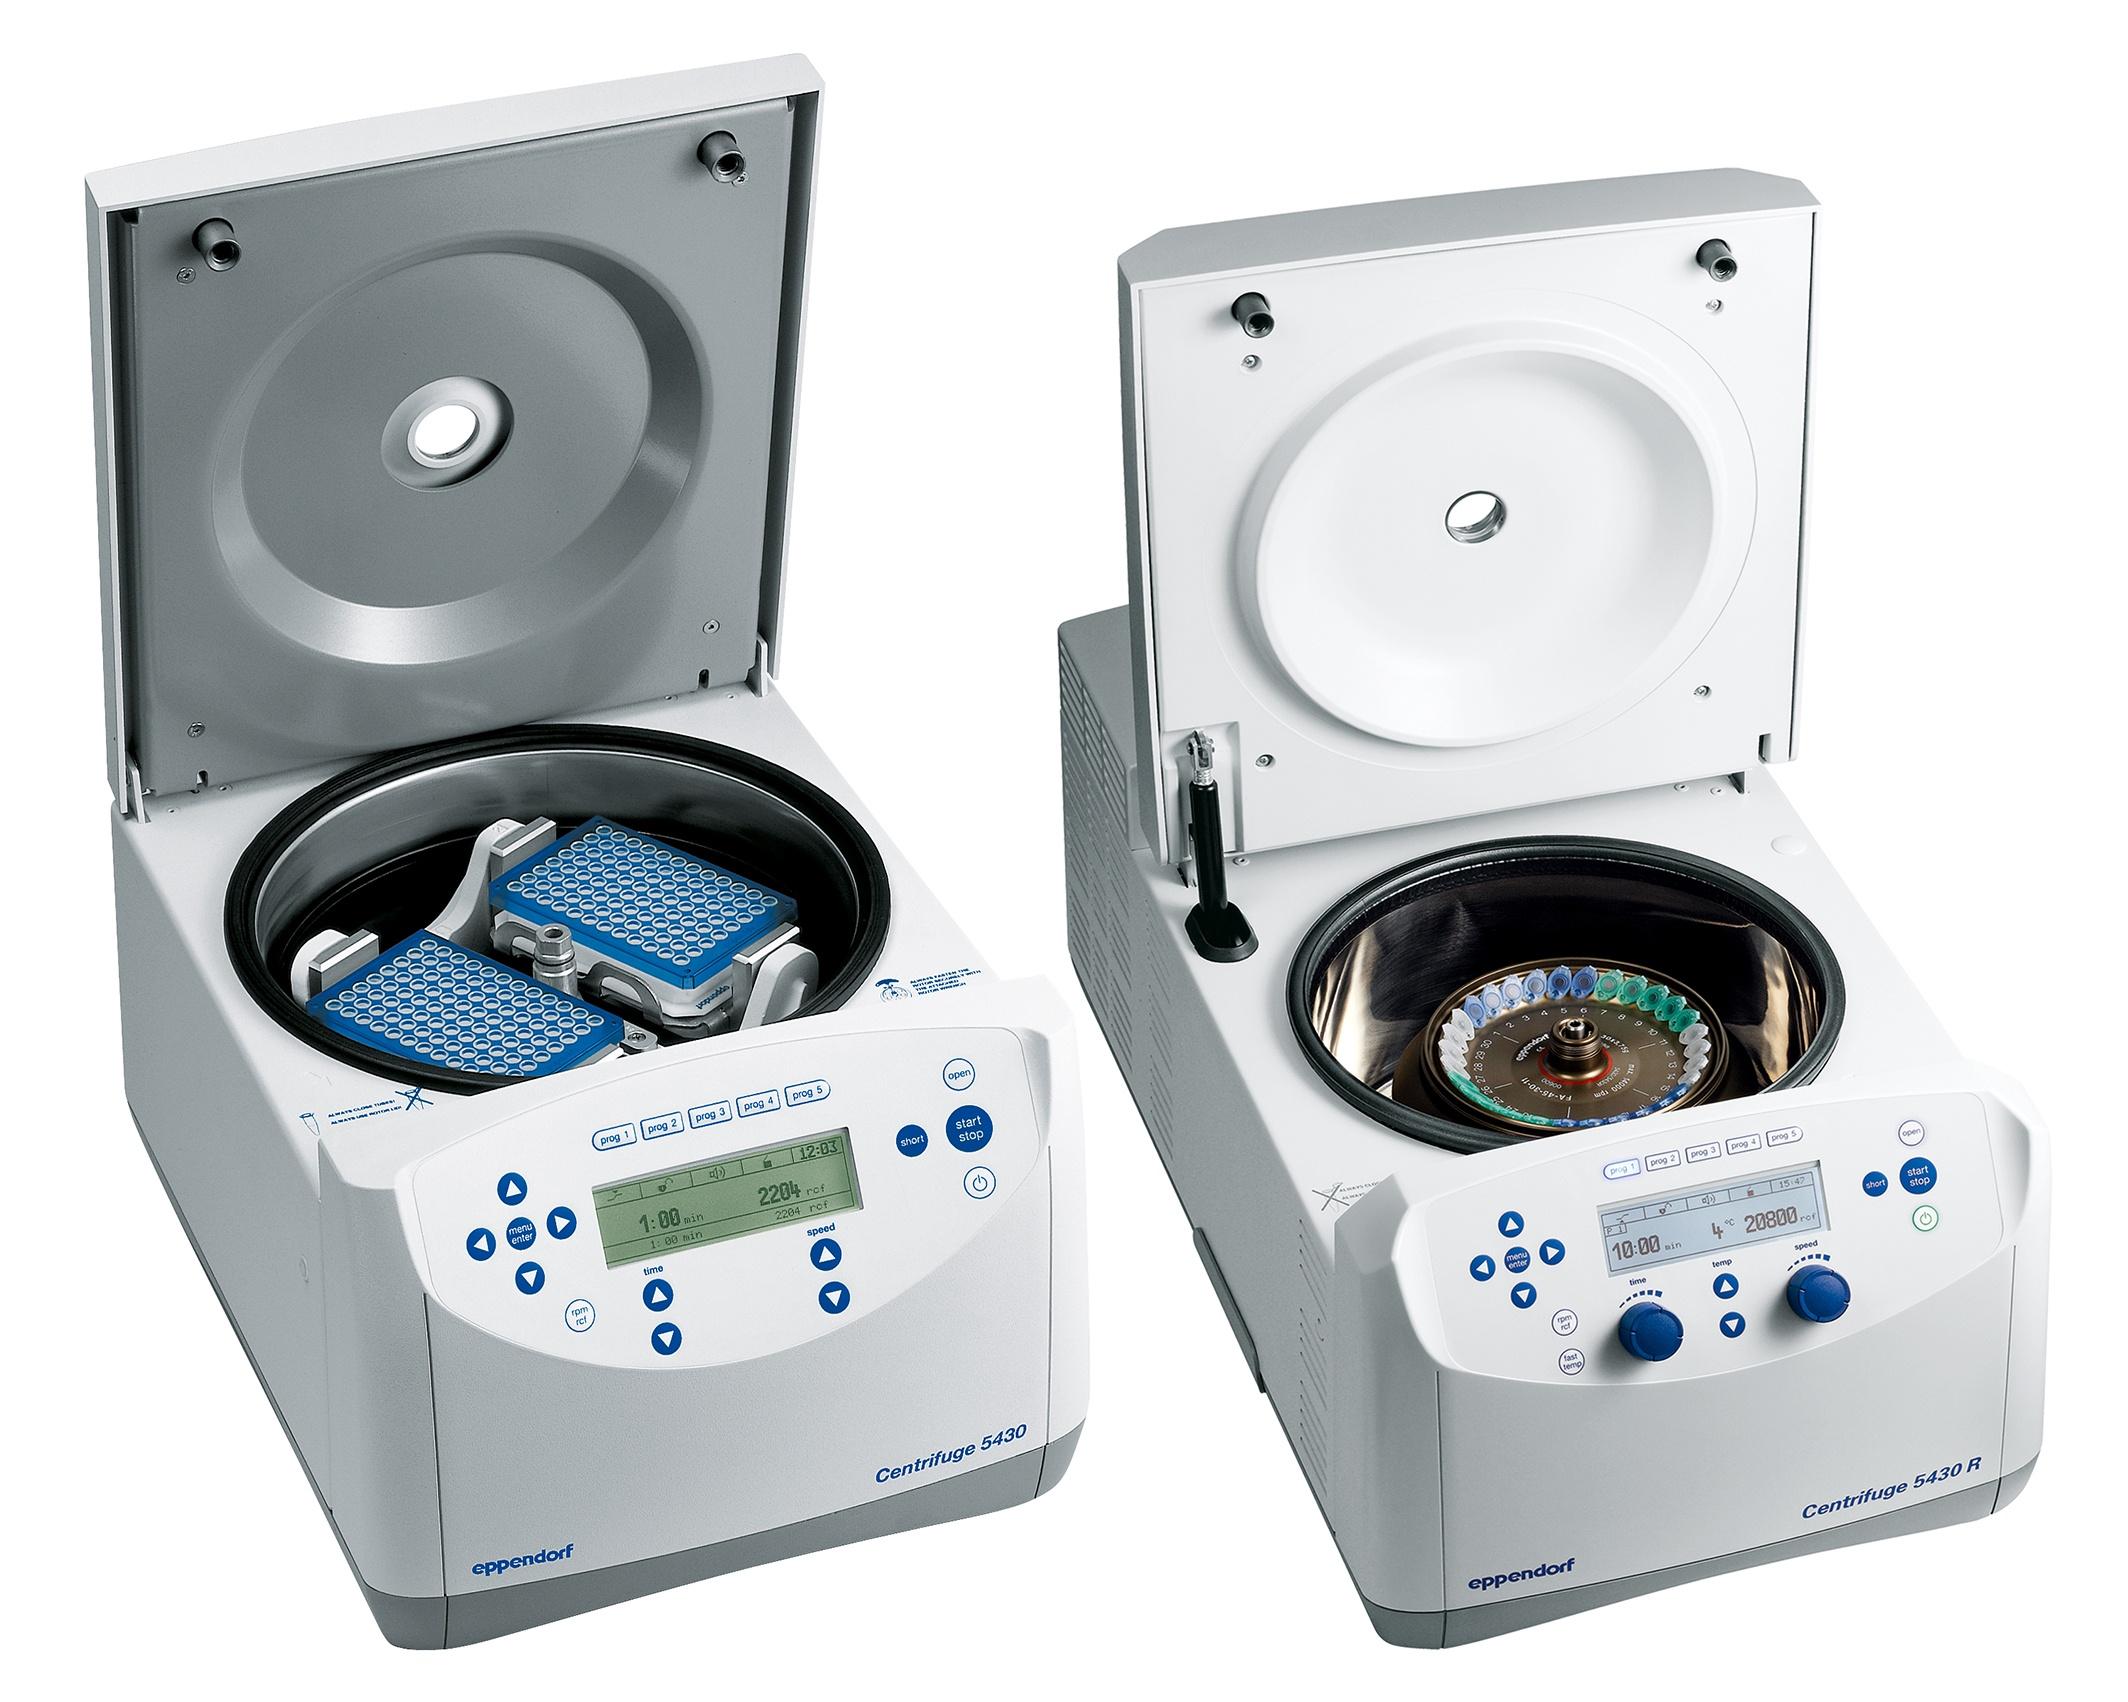 Eppendorf 5430 and 5430R Centrifuge